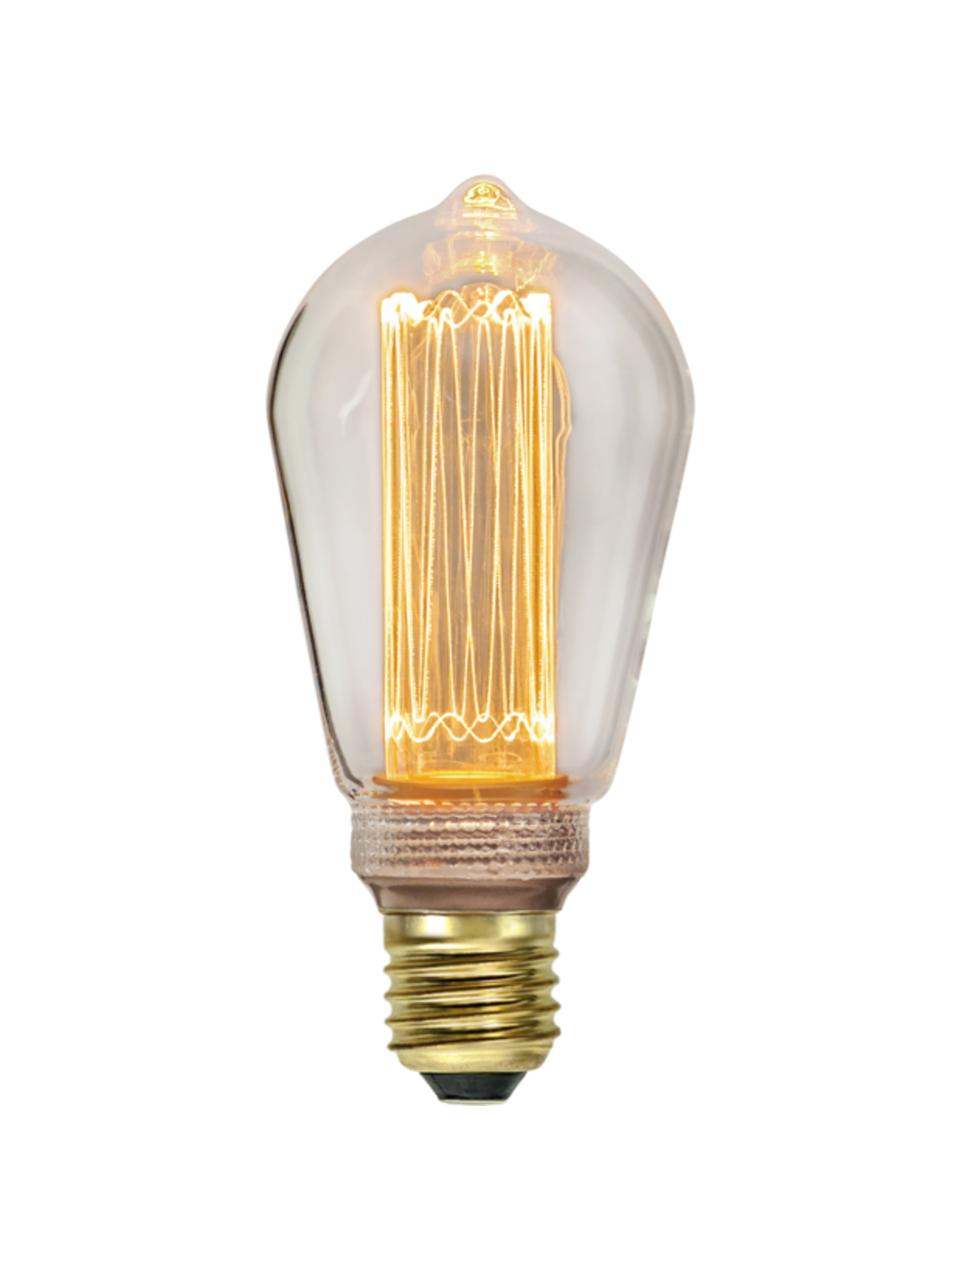 Lampadina E27, 2,5W, dimmerabile, bianco caldo 1 pz, Lampadina: vetro, Trasparente, Ø 6 x Alt. 15 cm